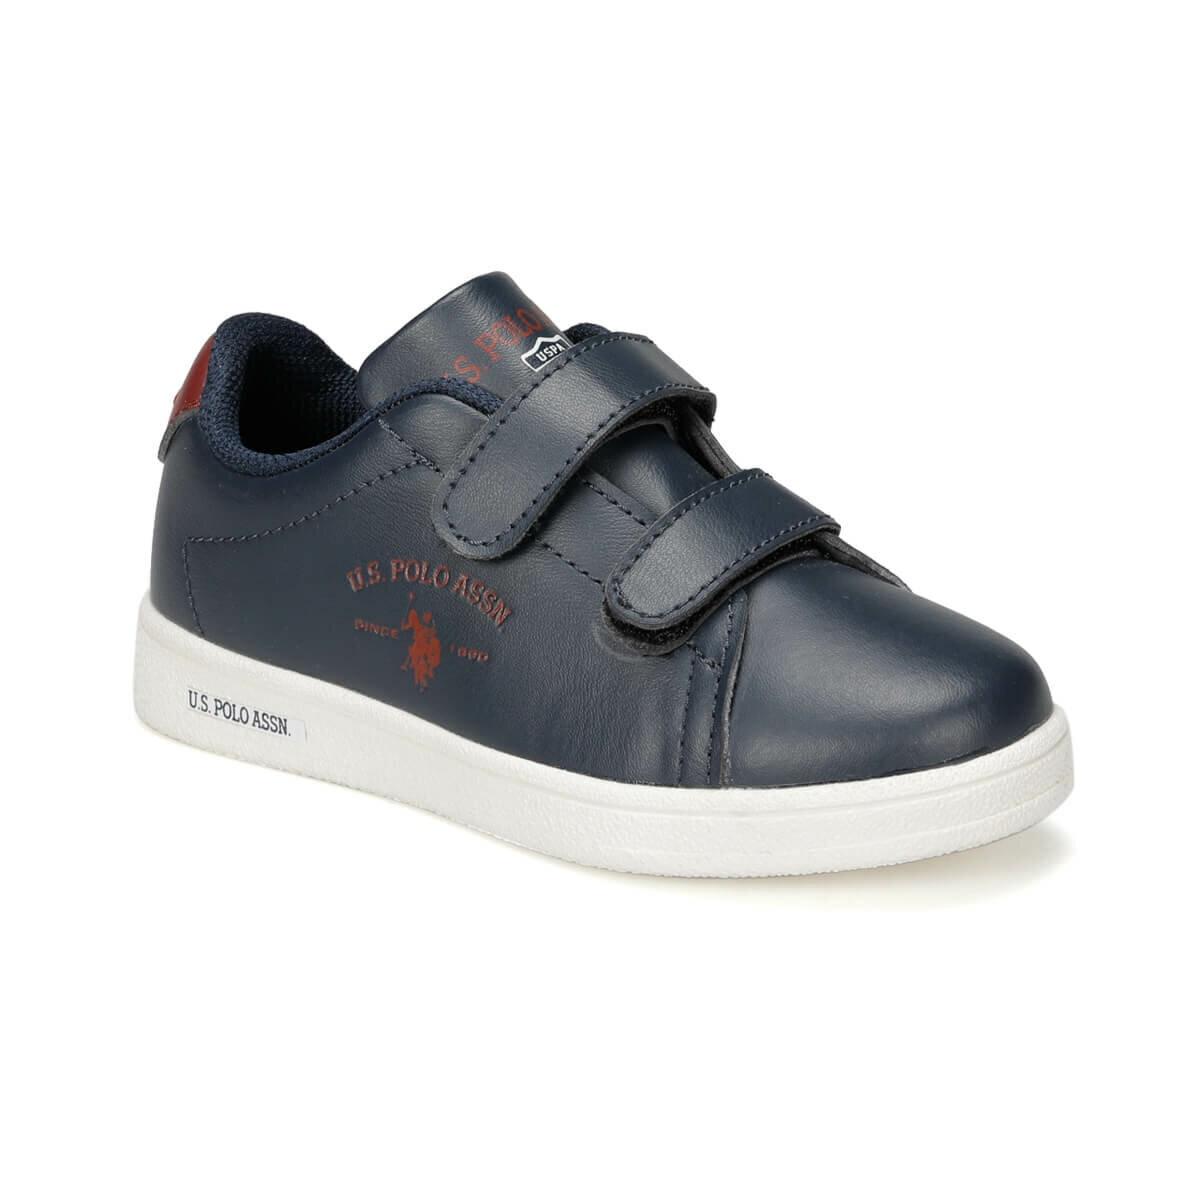 FLO SING 9PR Navy Blue Male Child Sneaker Shoes U.S. POLO ASSN.